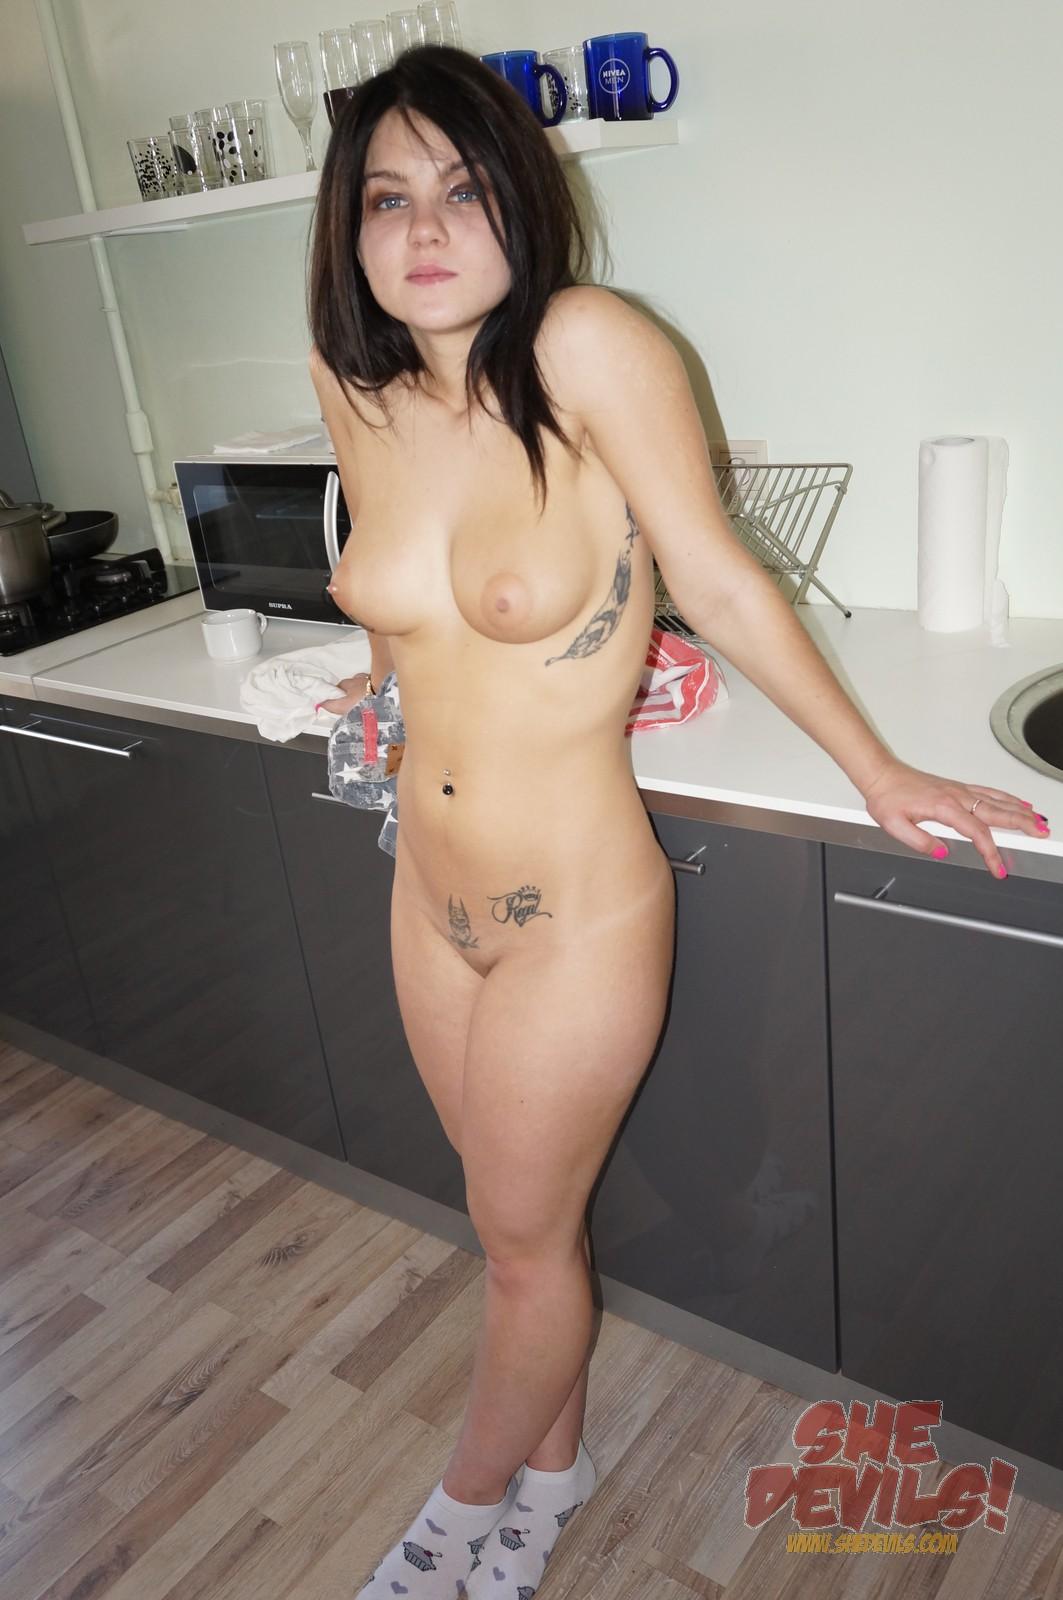 Nude Devil Image Erotic Photos Full HD